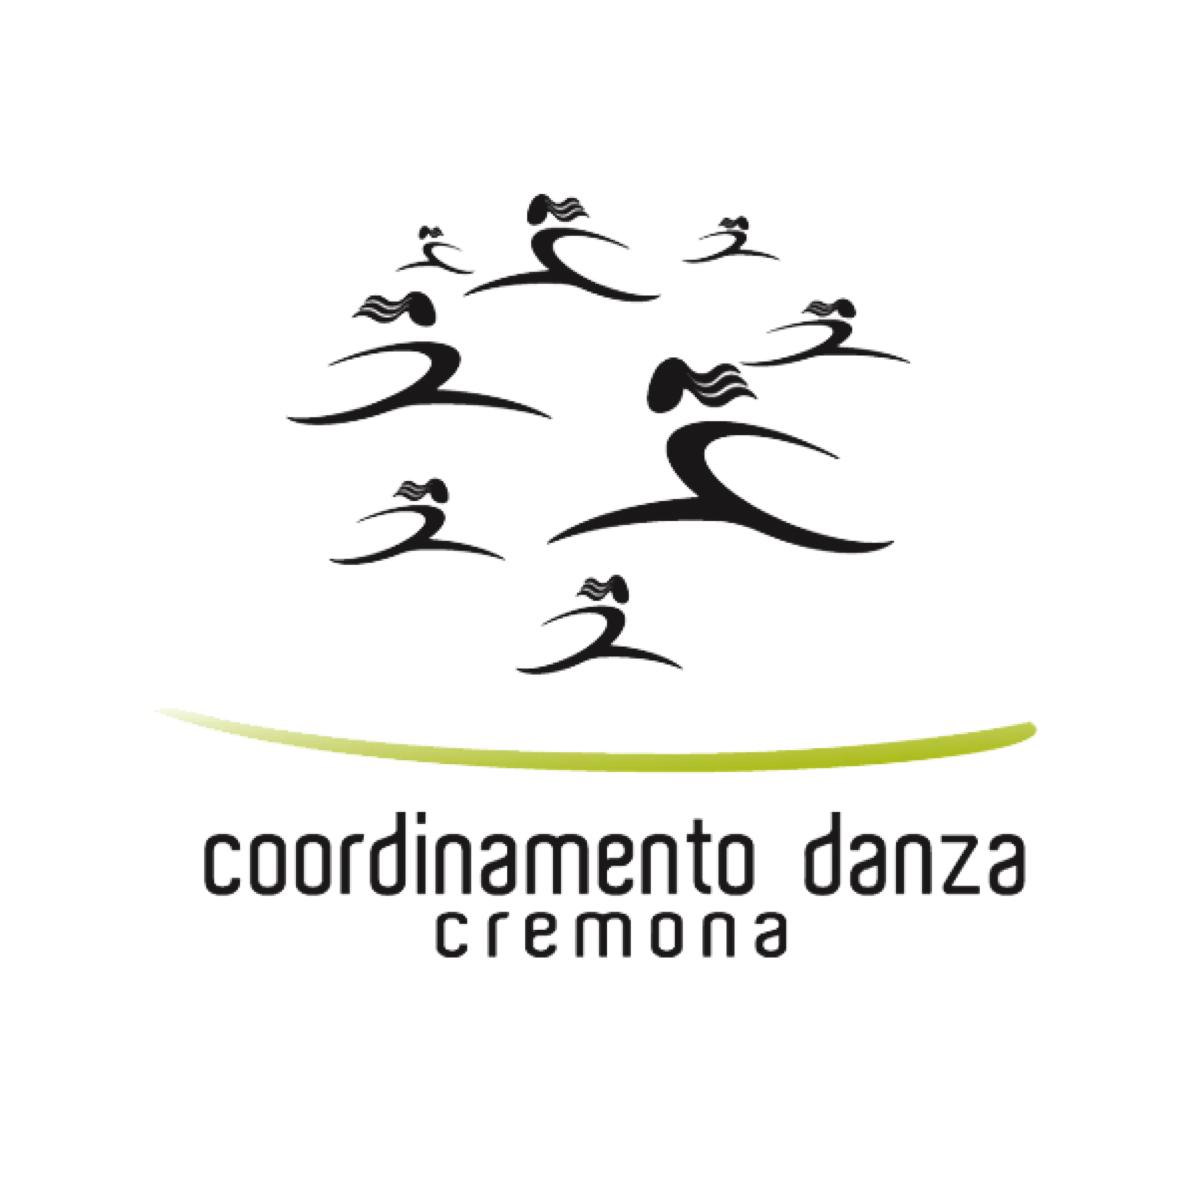 COORDINAMENTO DANZA CREMONA